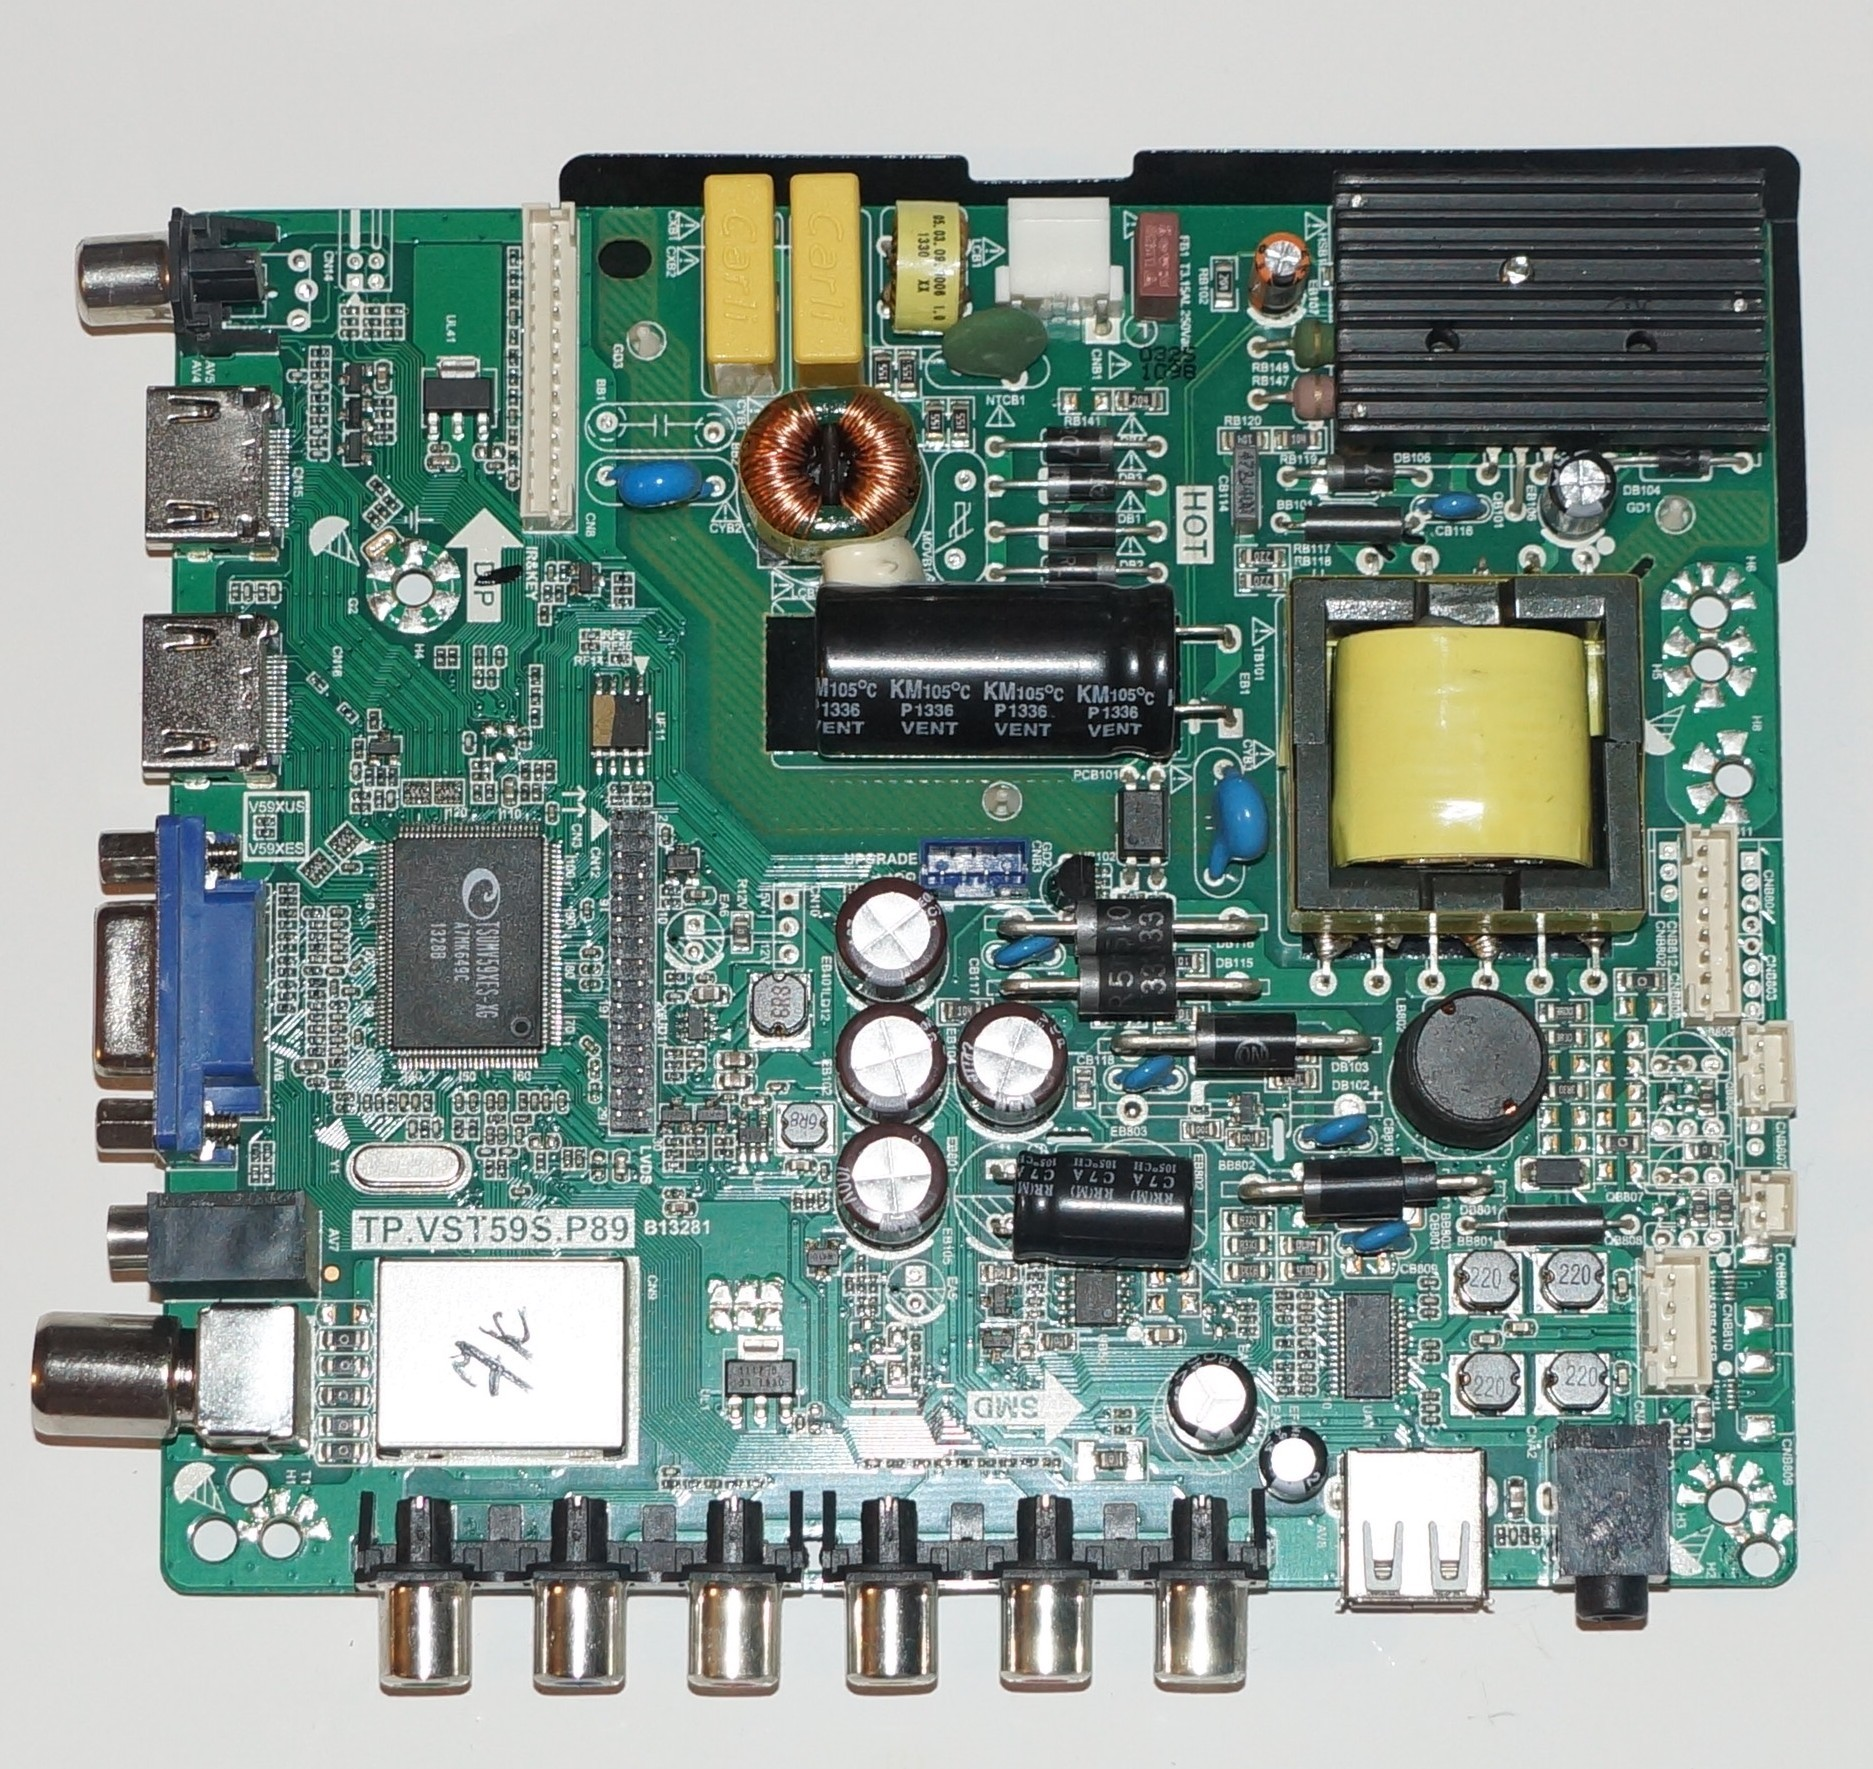 TP.VST59S.P89 mainboard телевизора Fusion